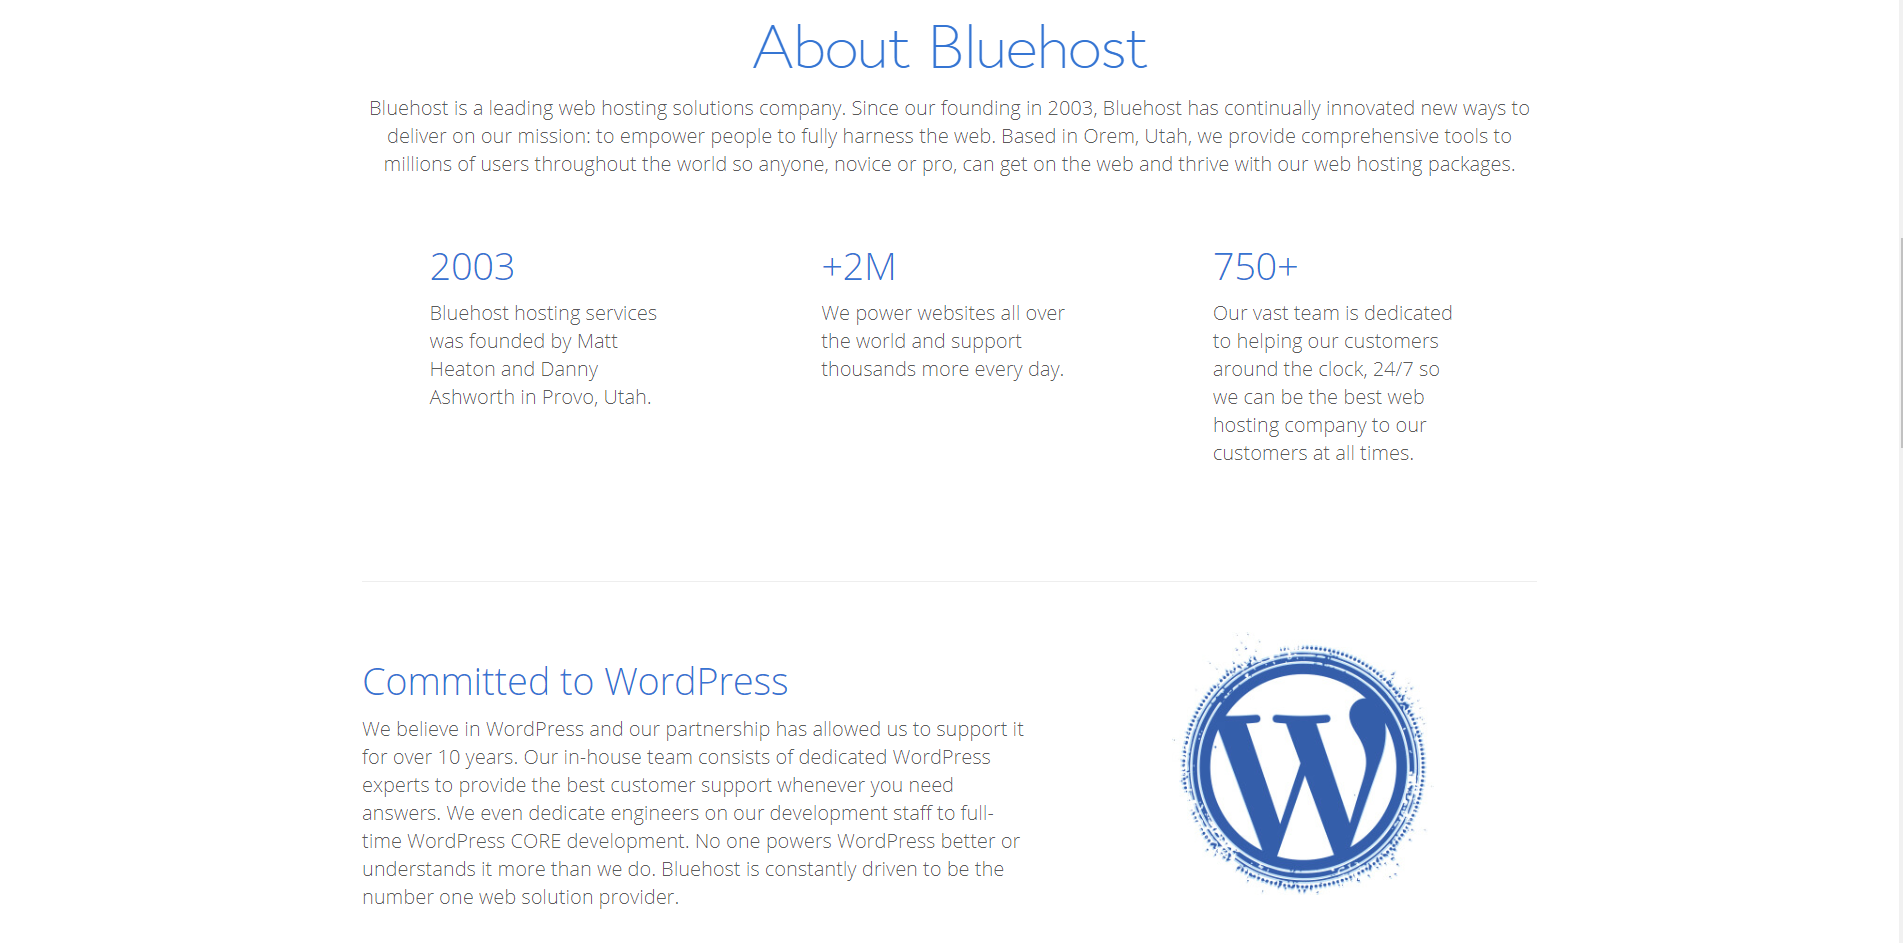 bluehost-webhosting